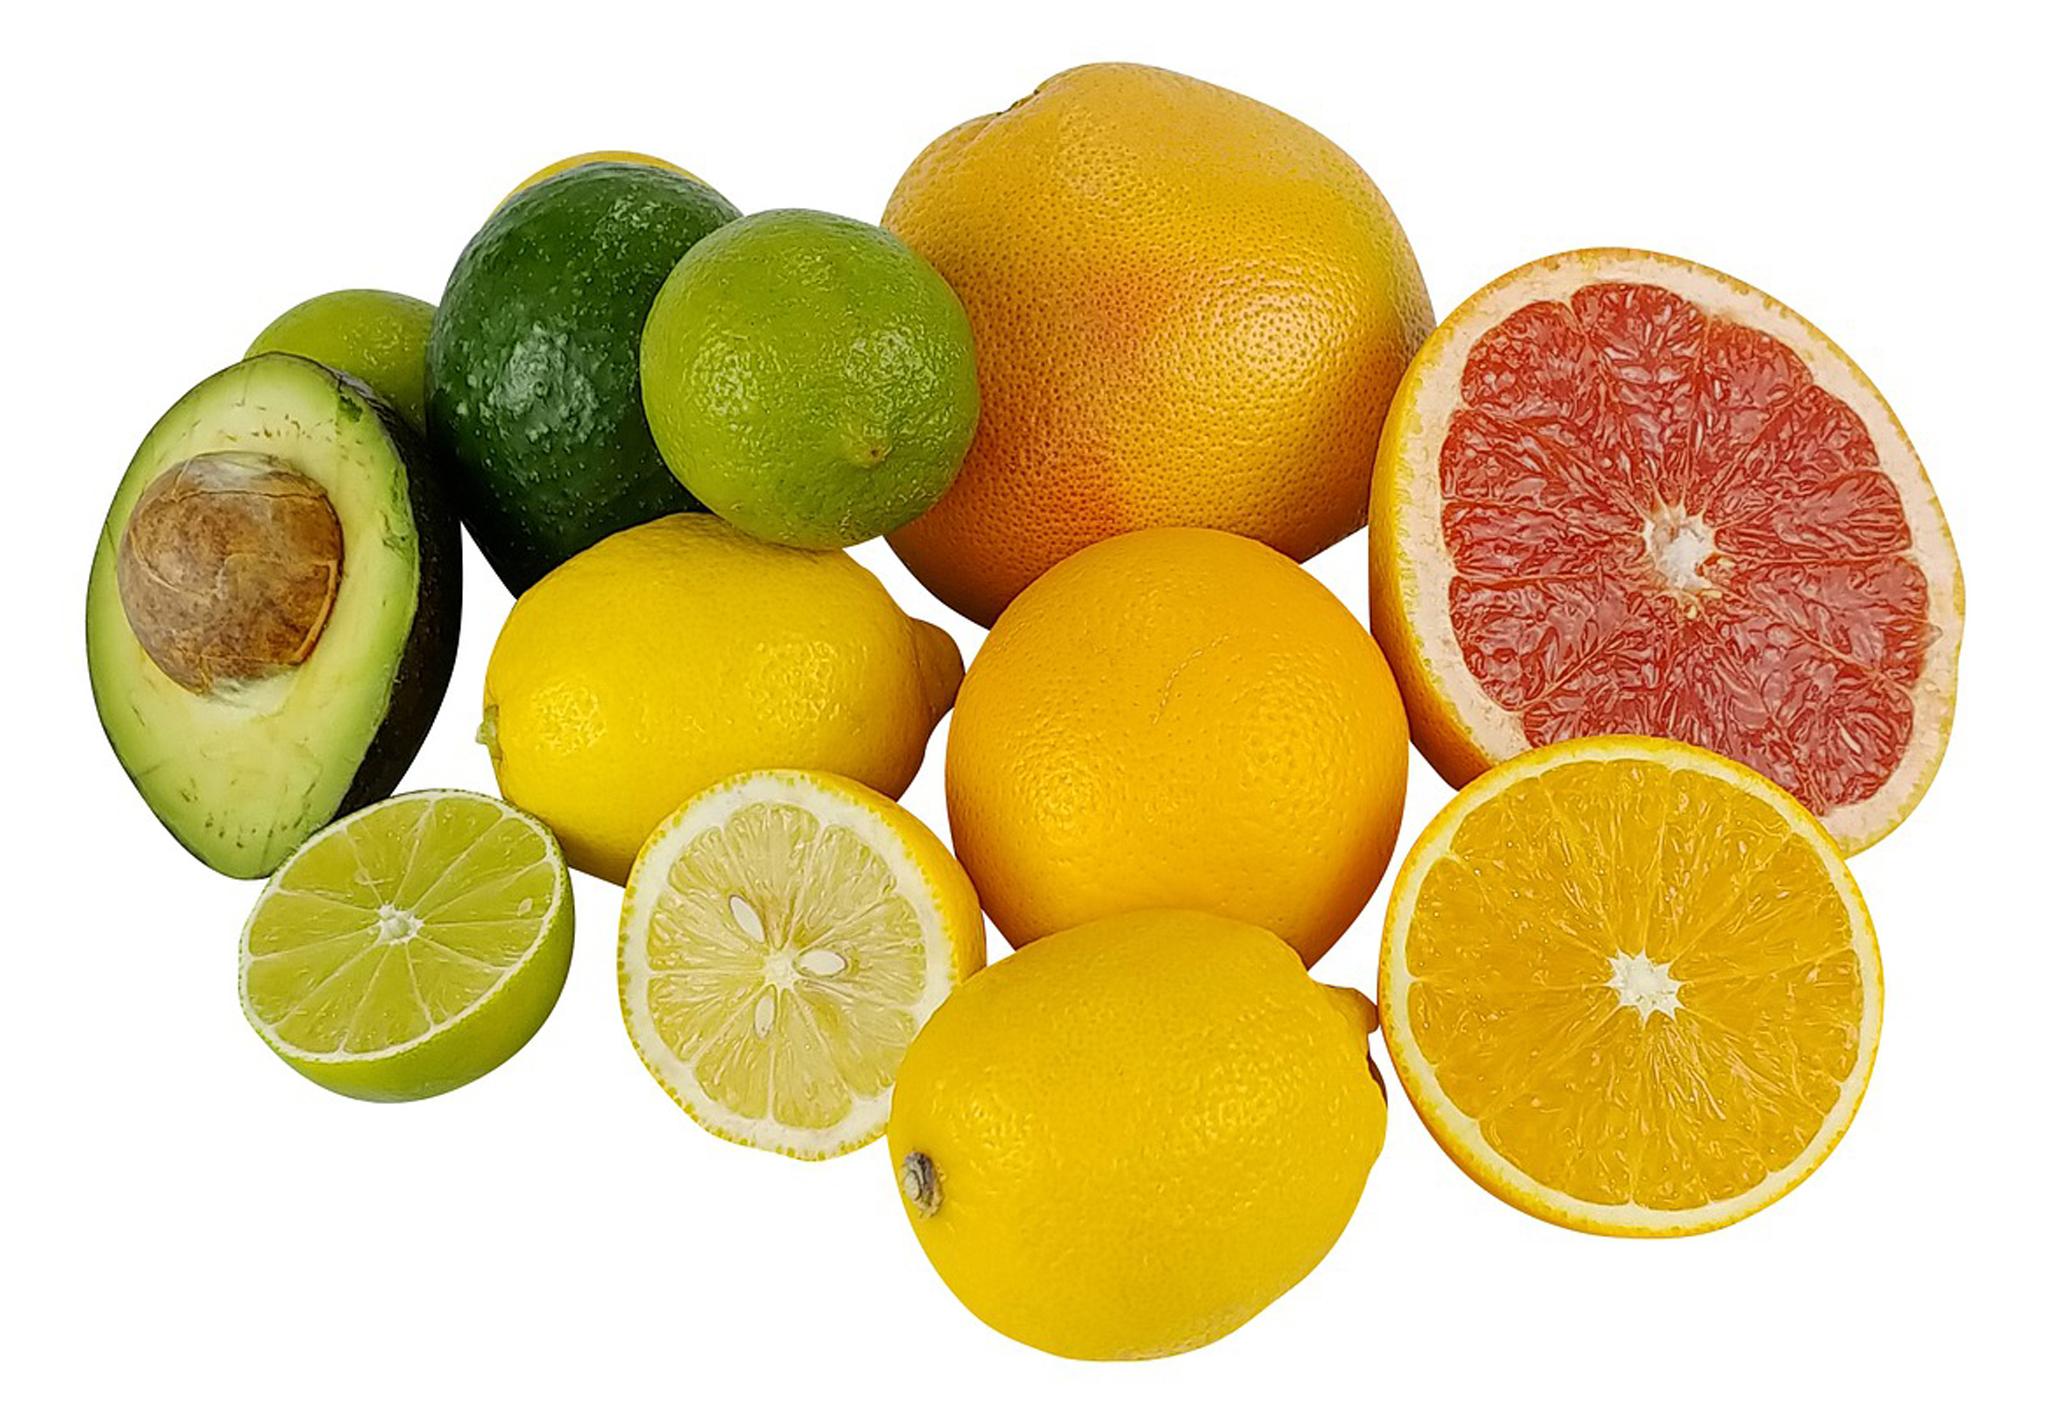 DIY自製水果化妝水,打造個人專屬的保養品。